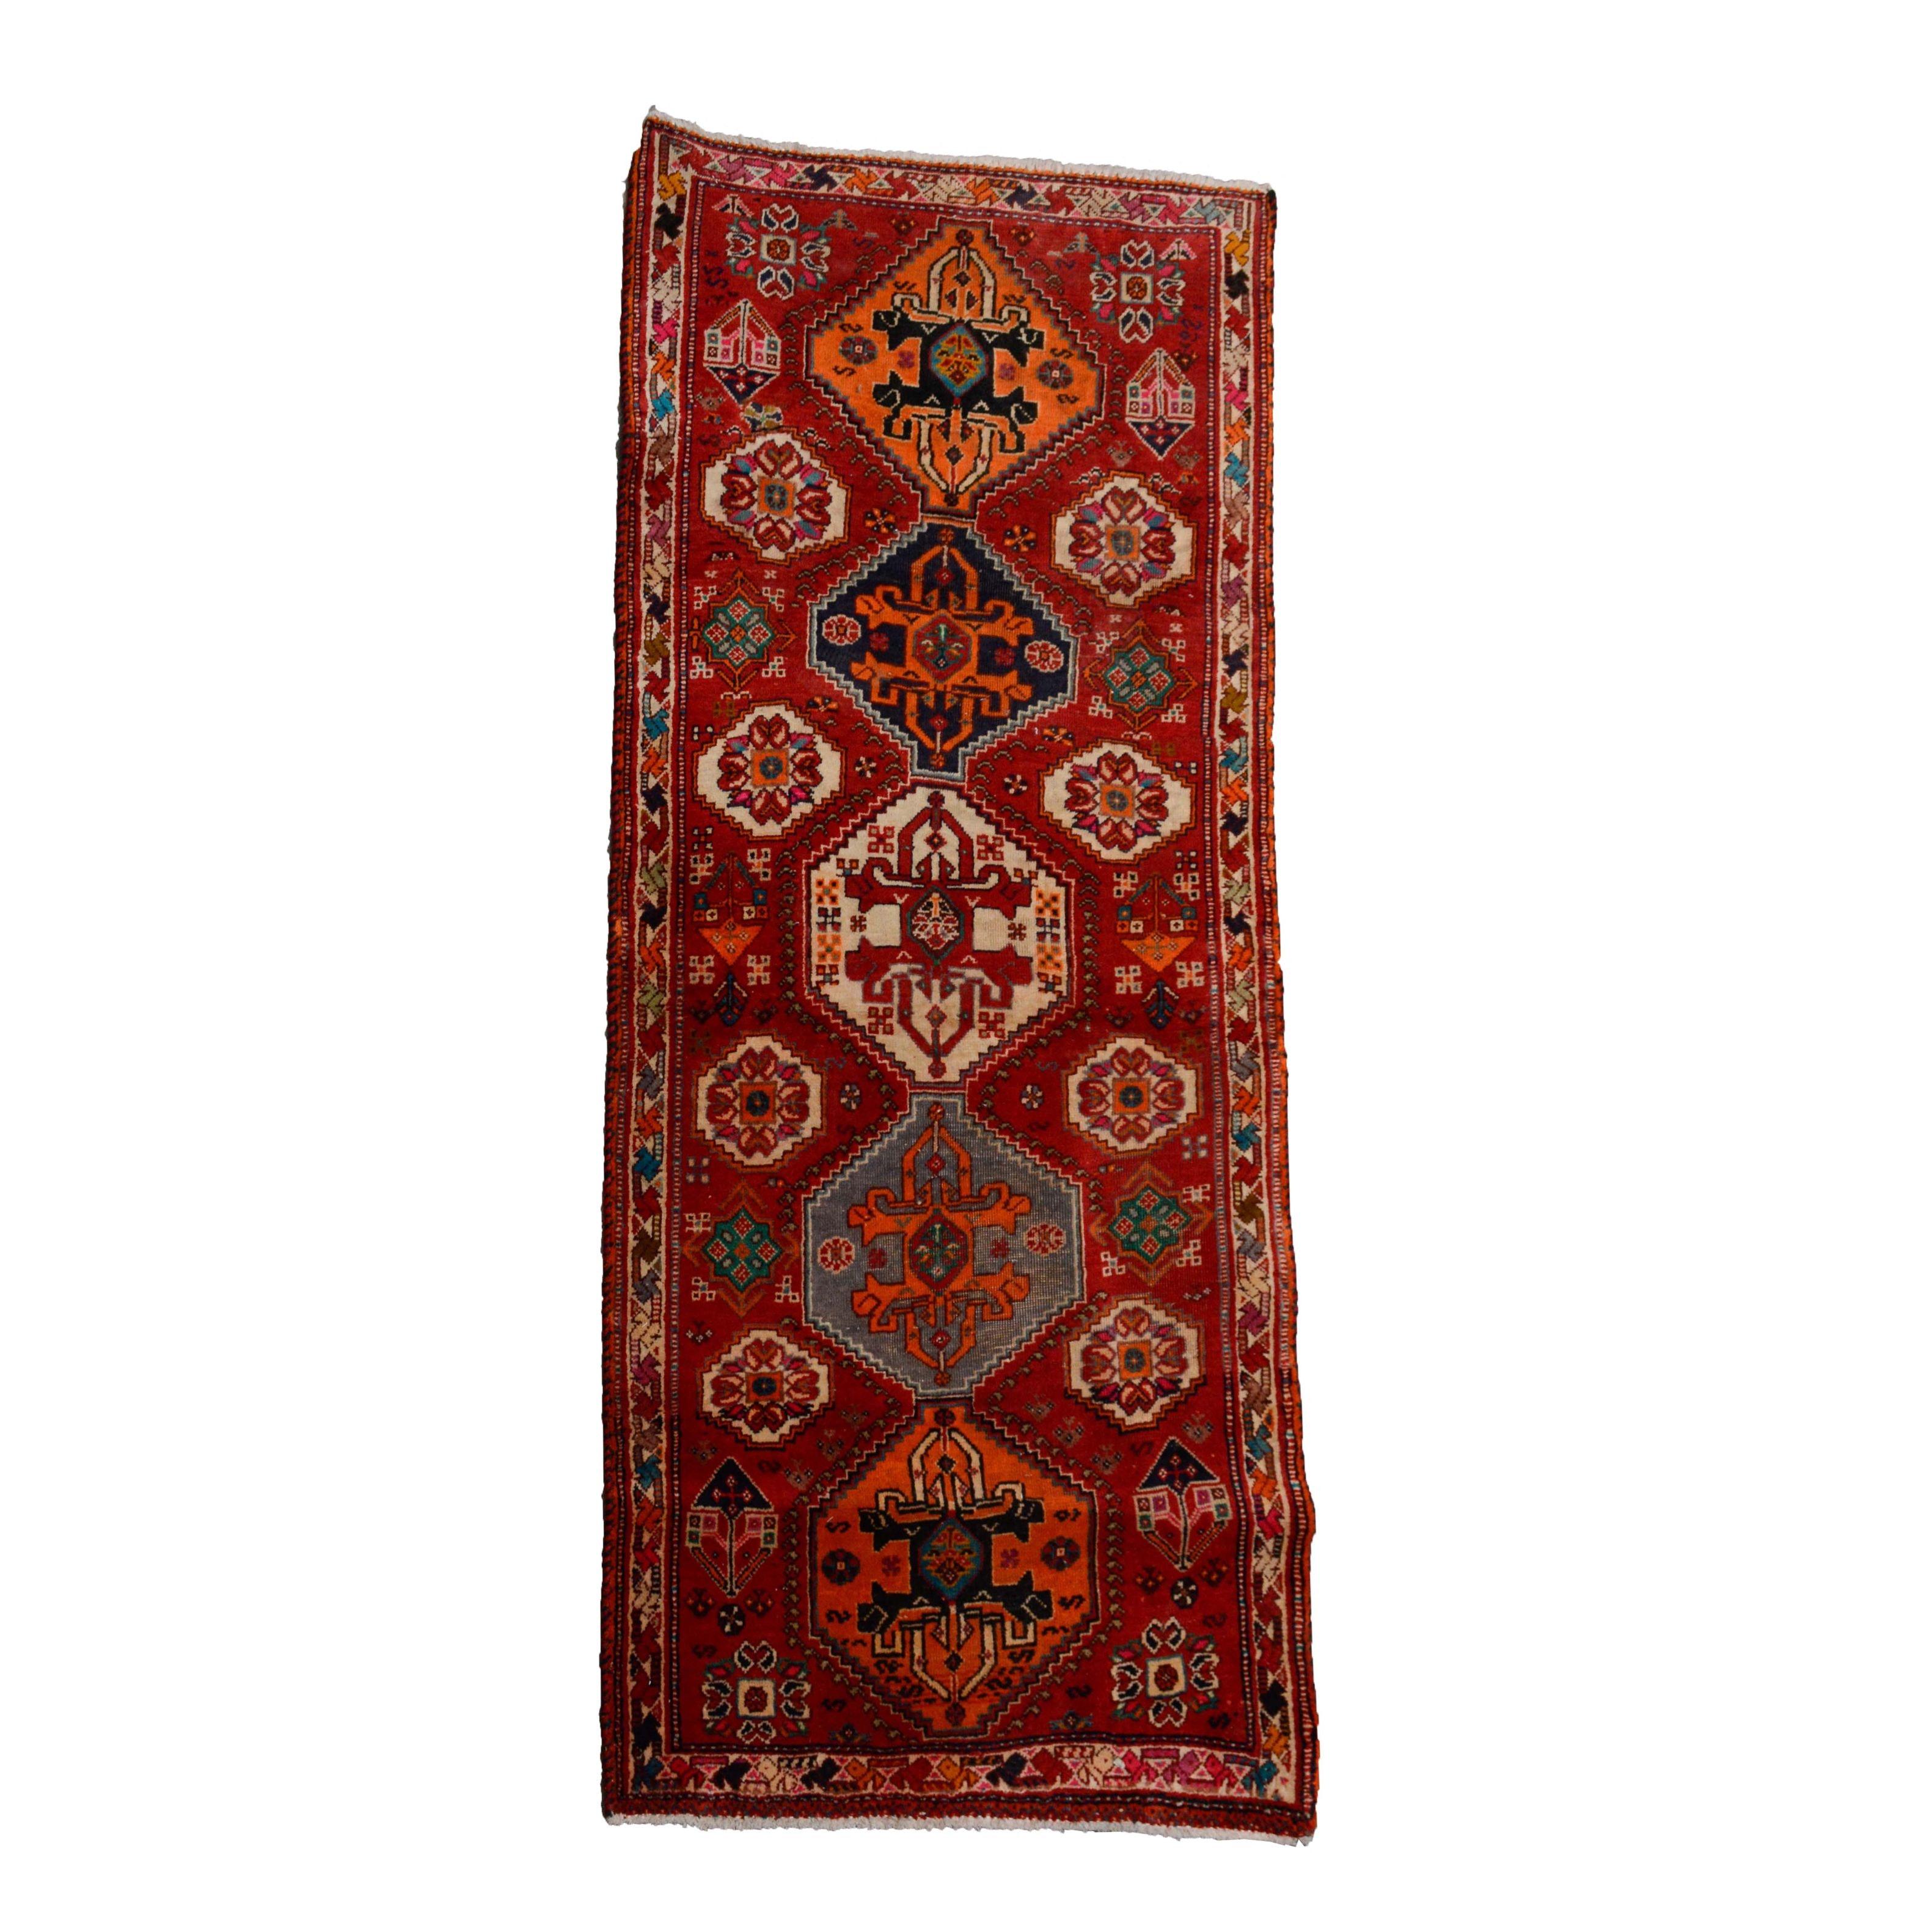 Hand-Knotted Qashqai Wool Carpet Runner